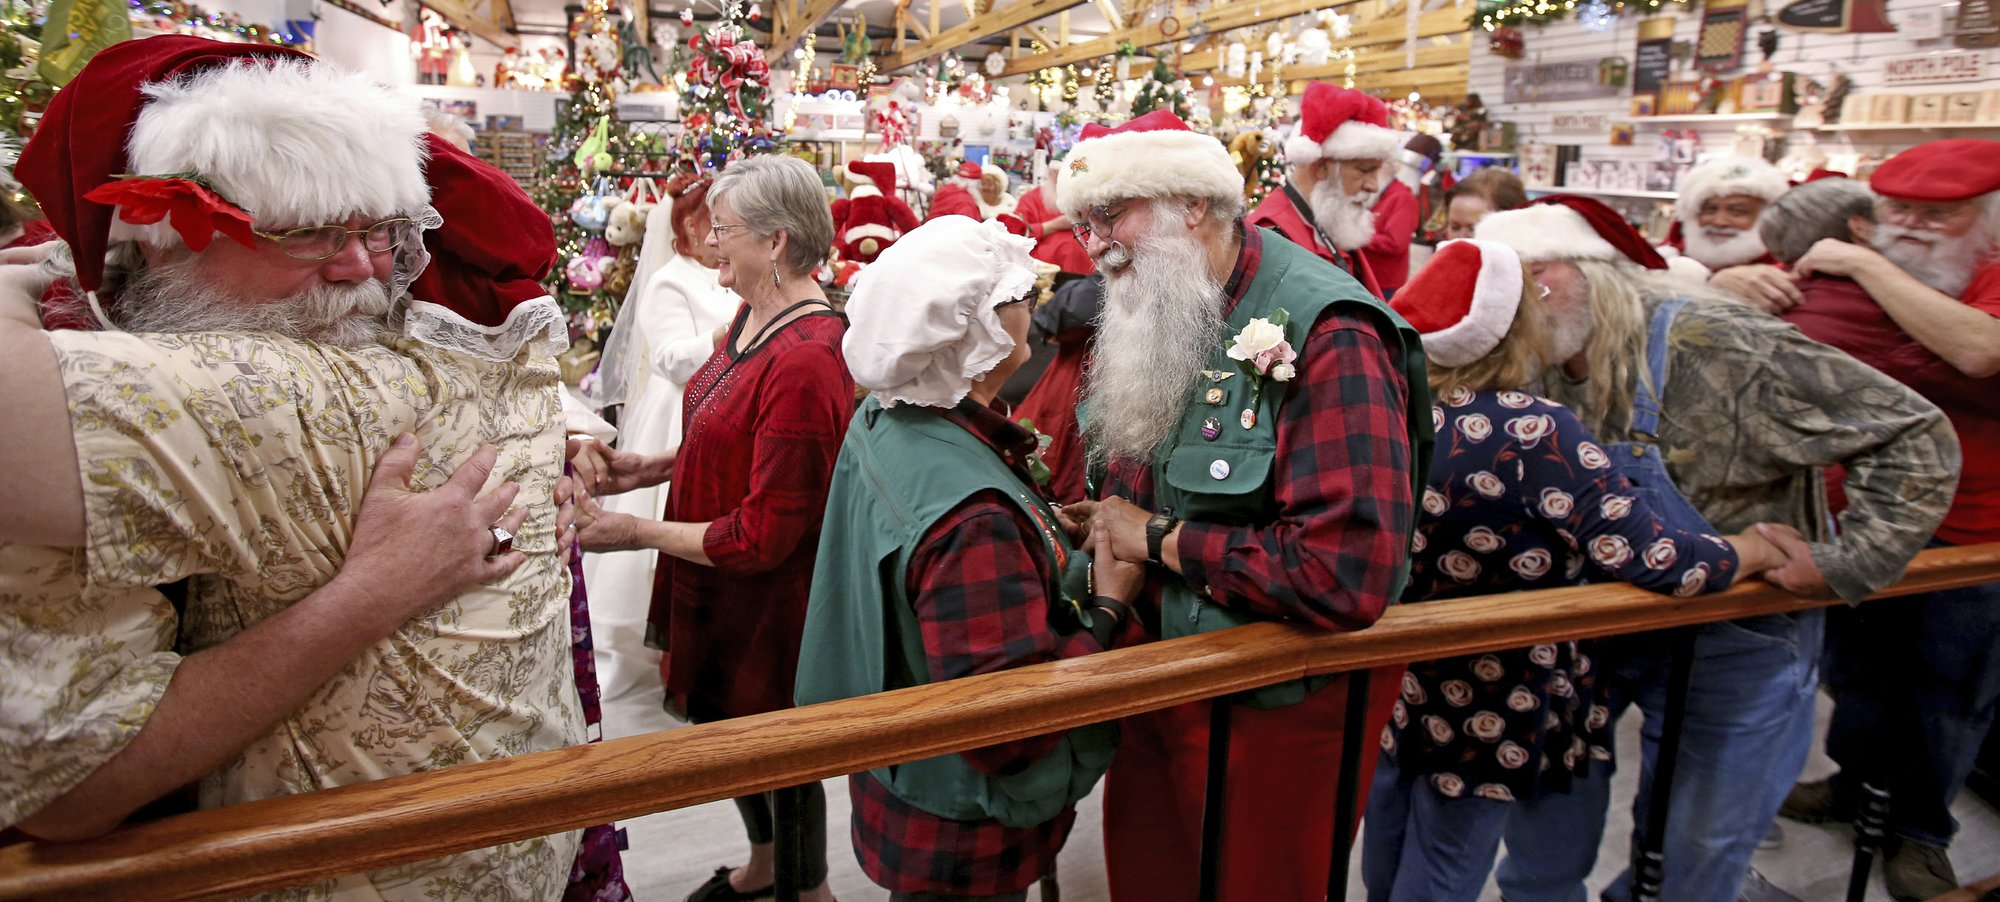 Christmas lovers travel to Santa house in North Pole, Alaska